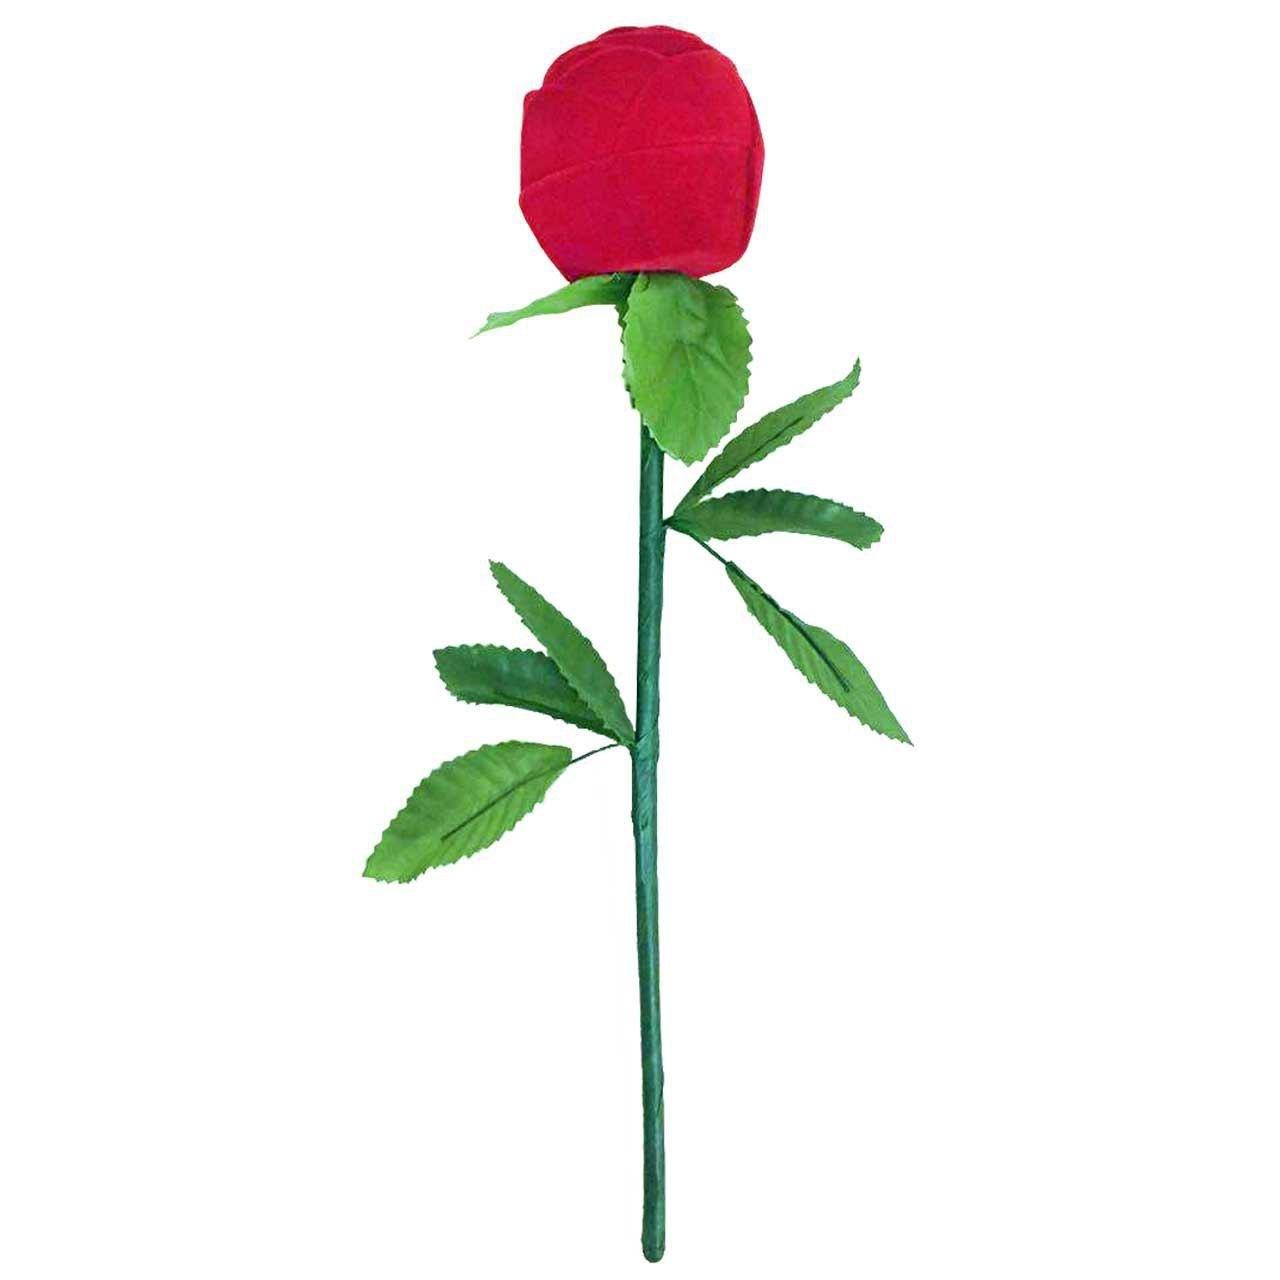 جعبه انگشتر مدل گل سرخ